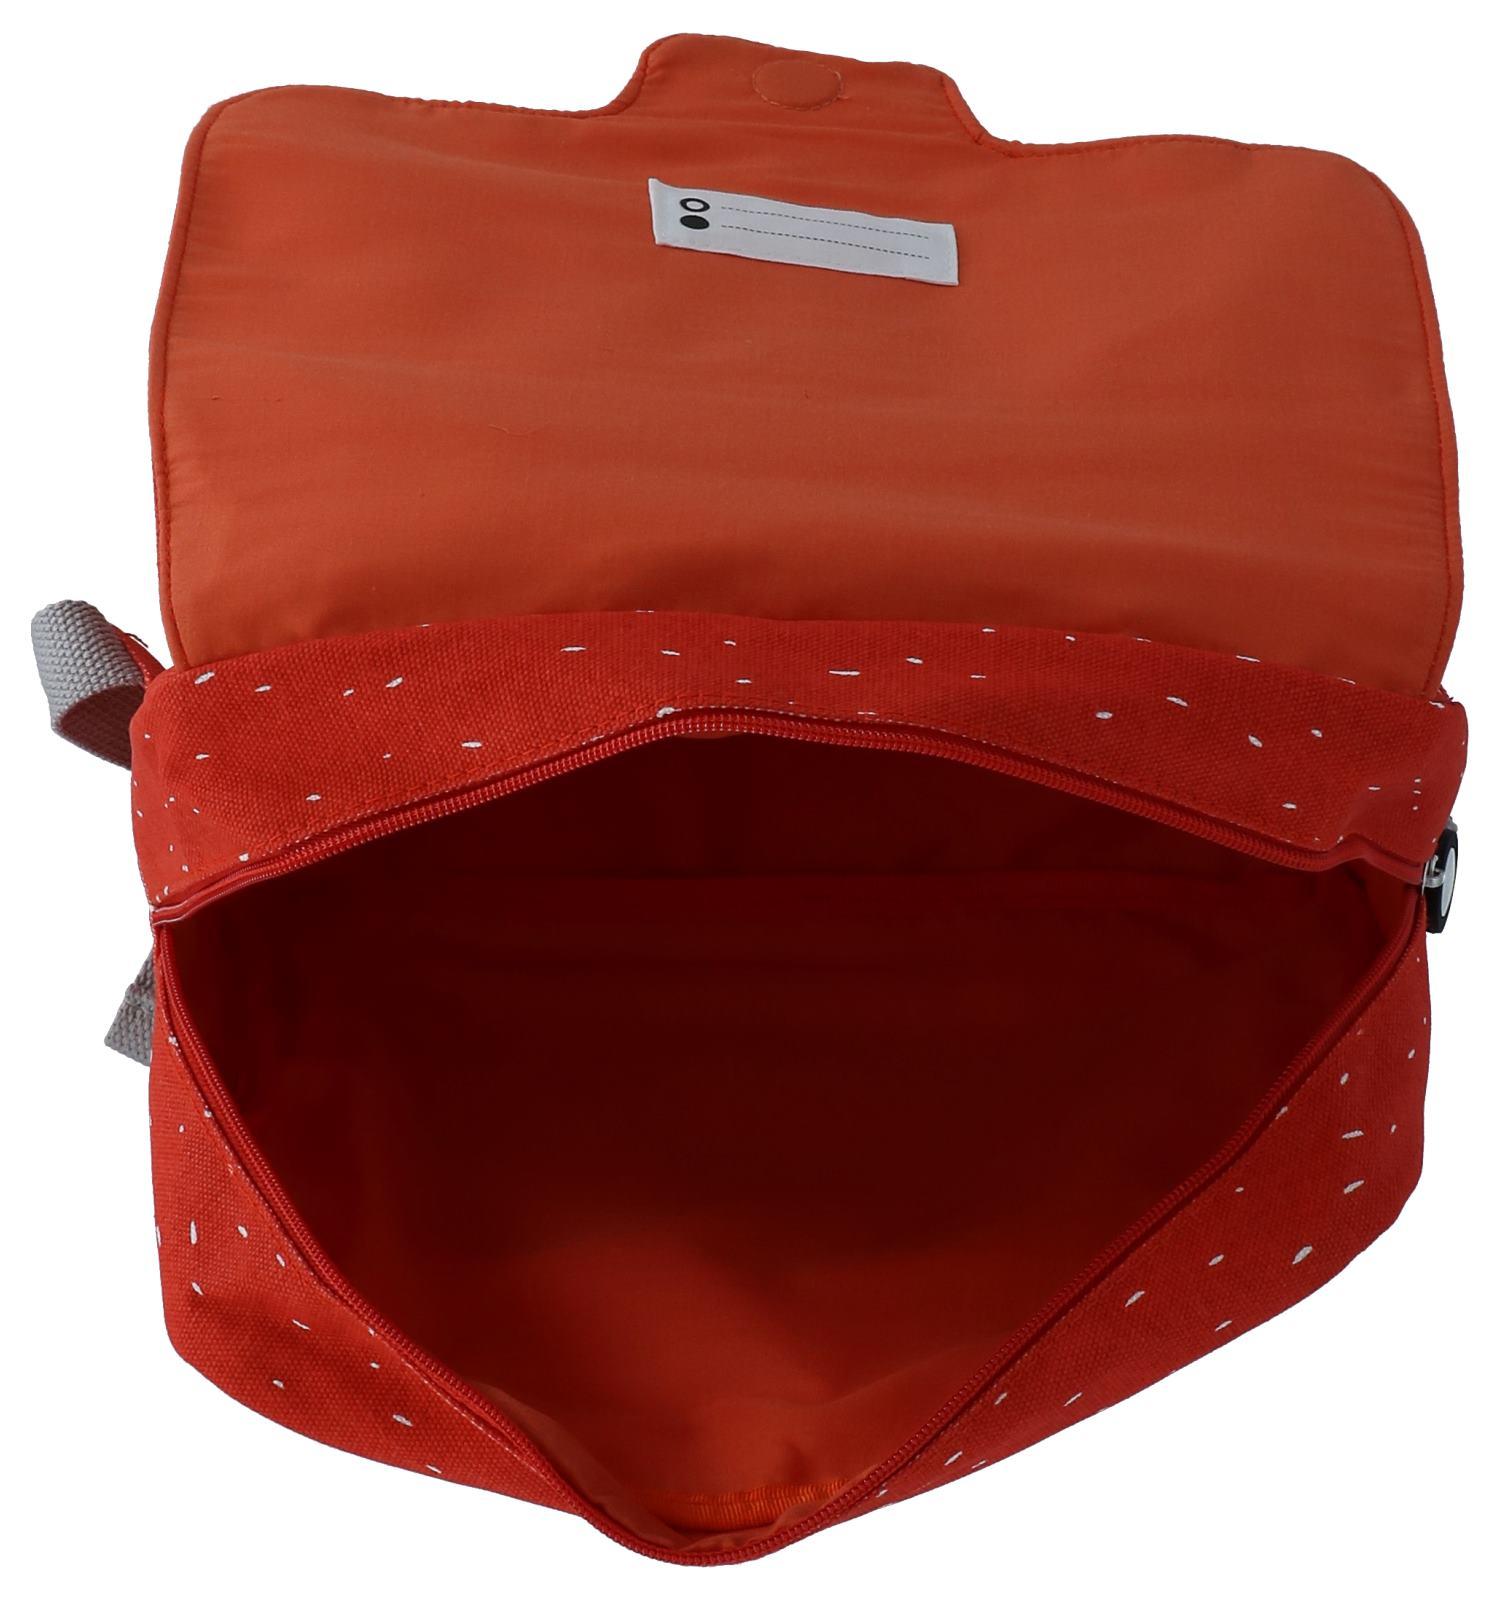 4f7edaecdfc Rode Boekentas Trixie Mrs. Crab | TORFS.BE | Gratis verzend en retour